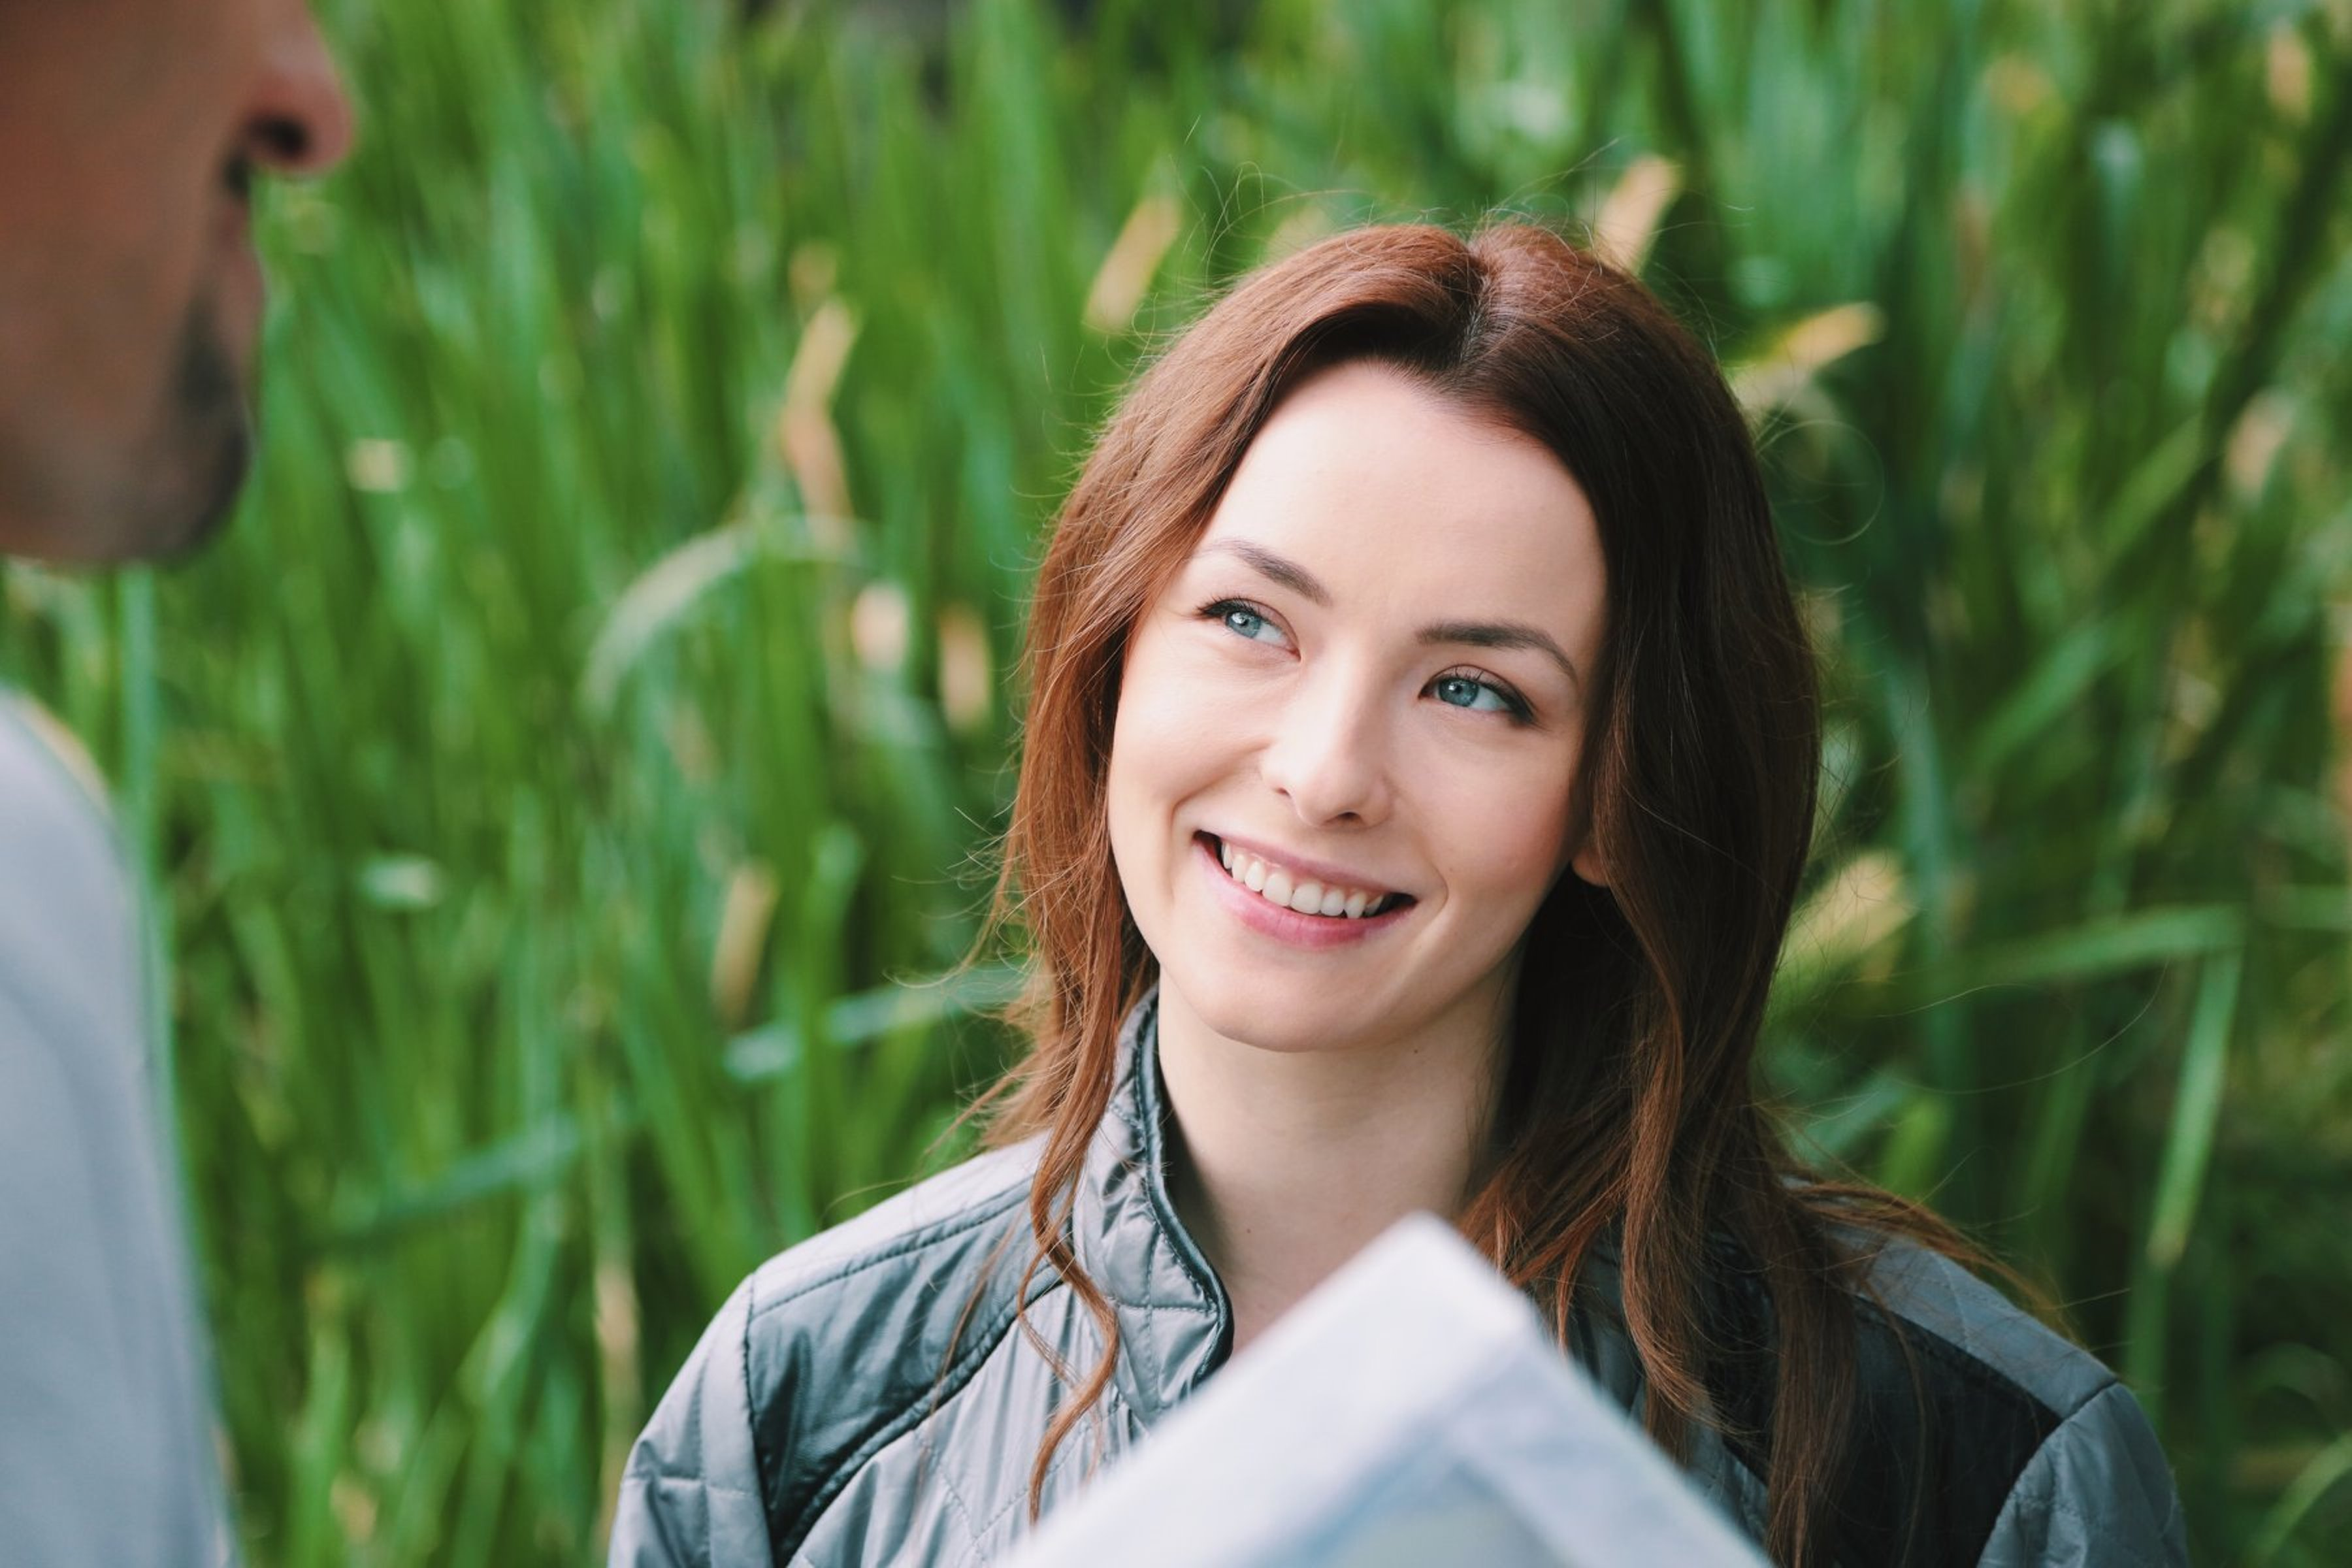 Актриса Анастасия Иванова